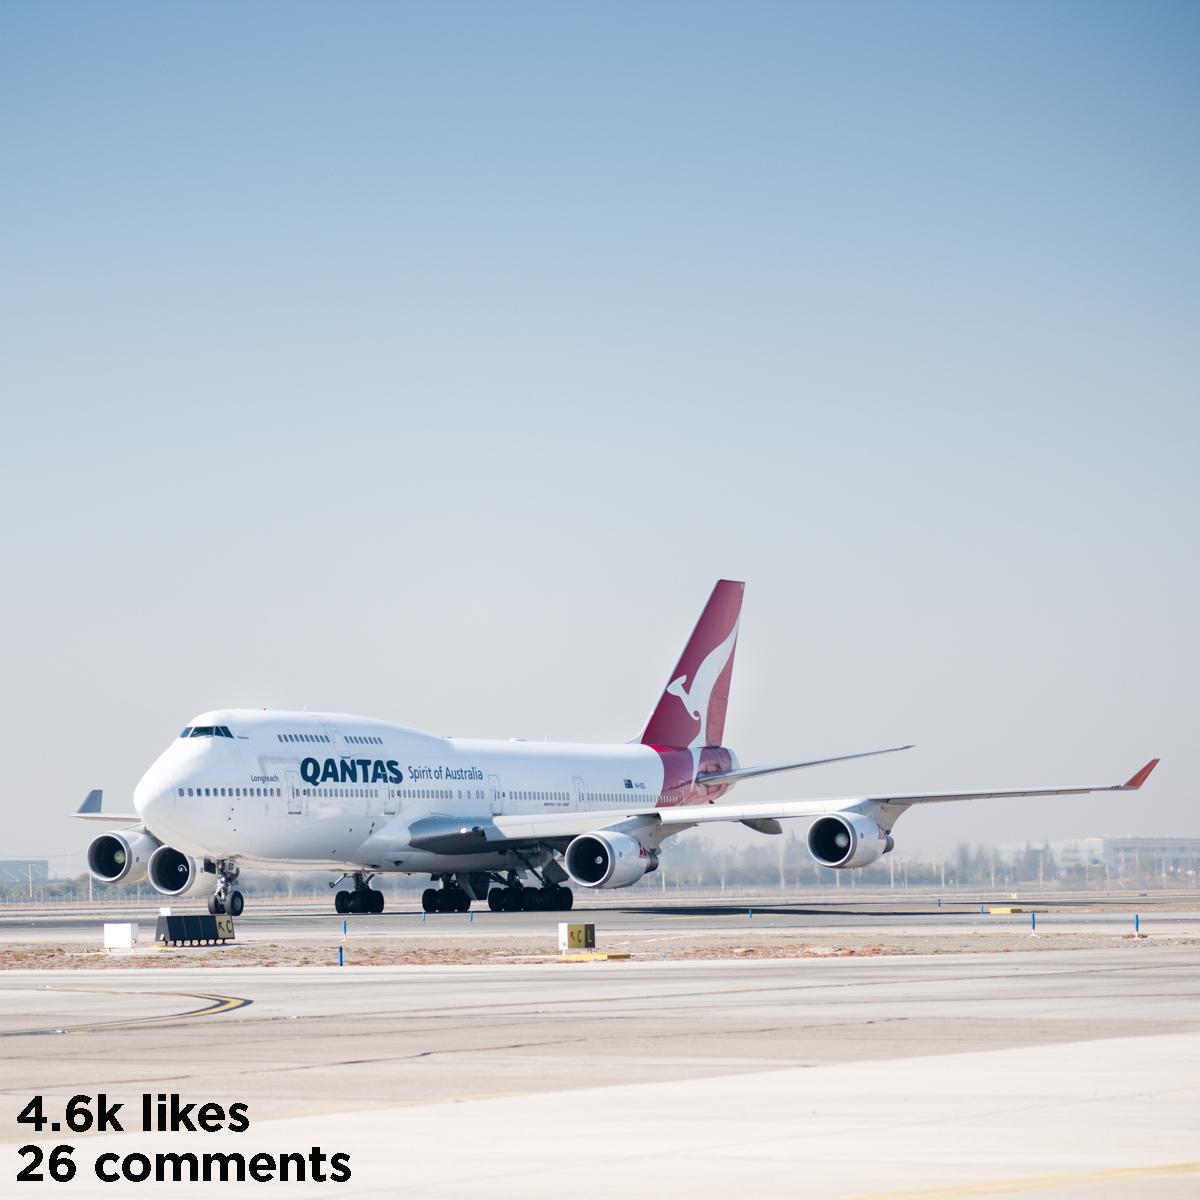 qantas 747 for wallpaper (1 of 1).jpg